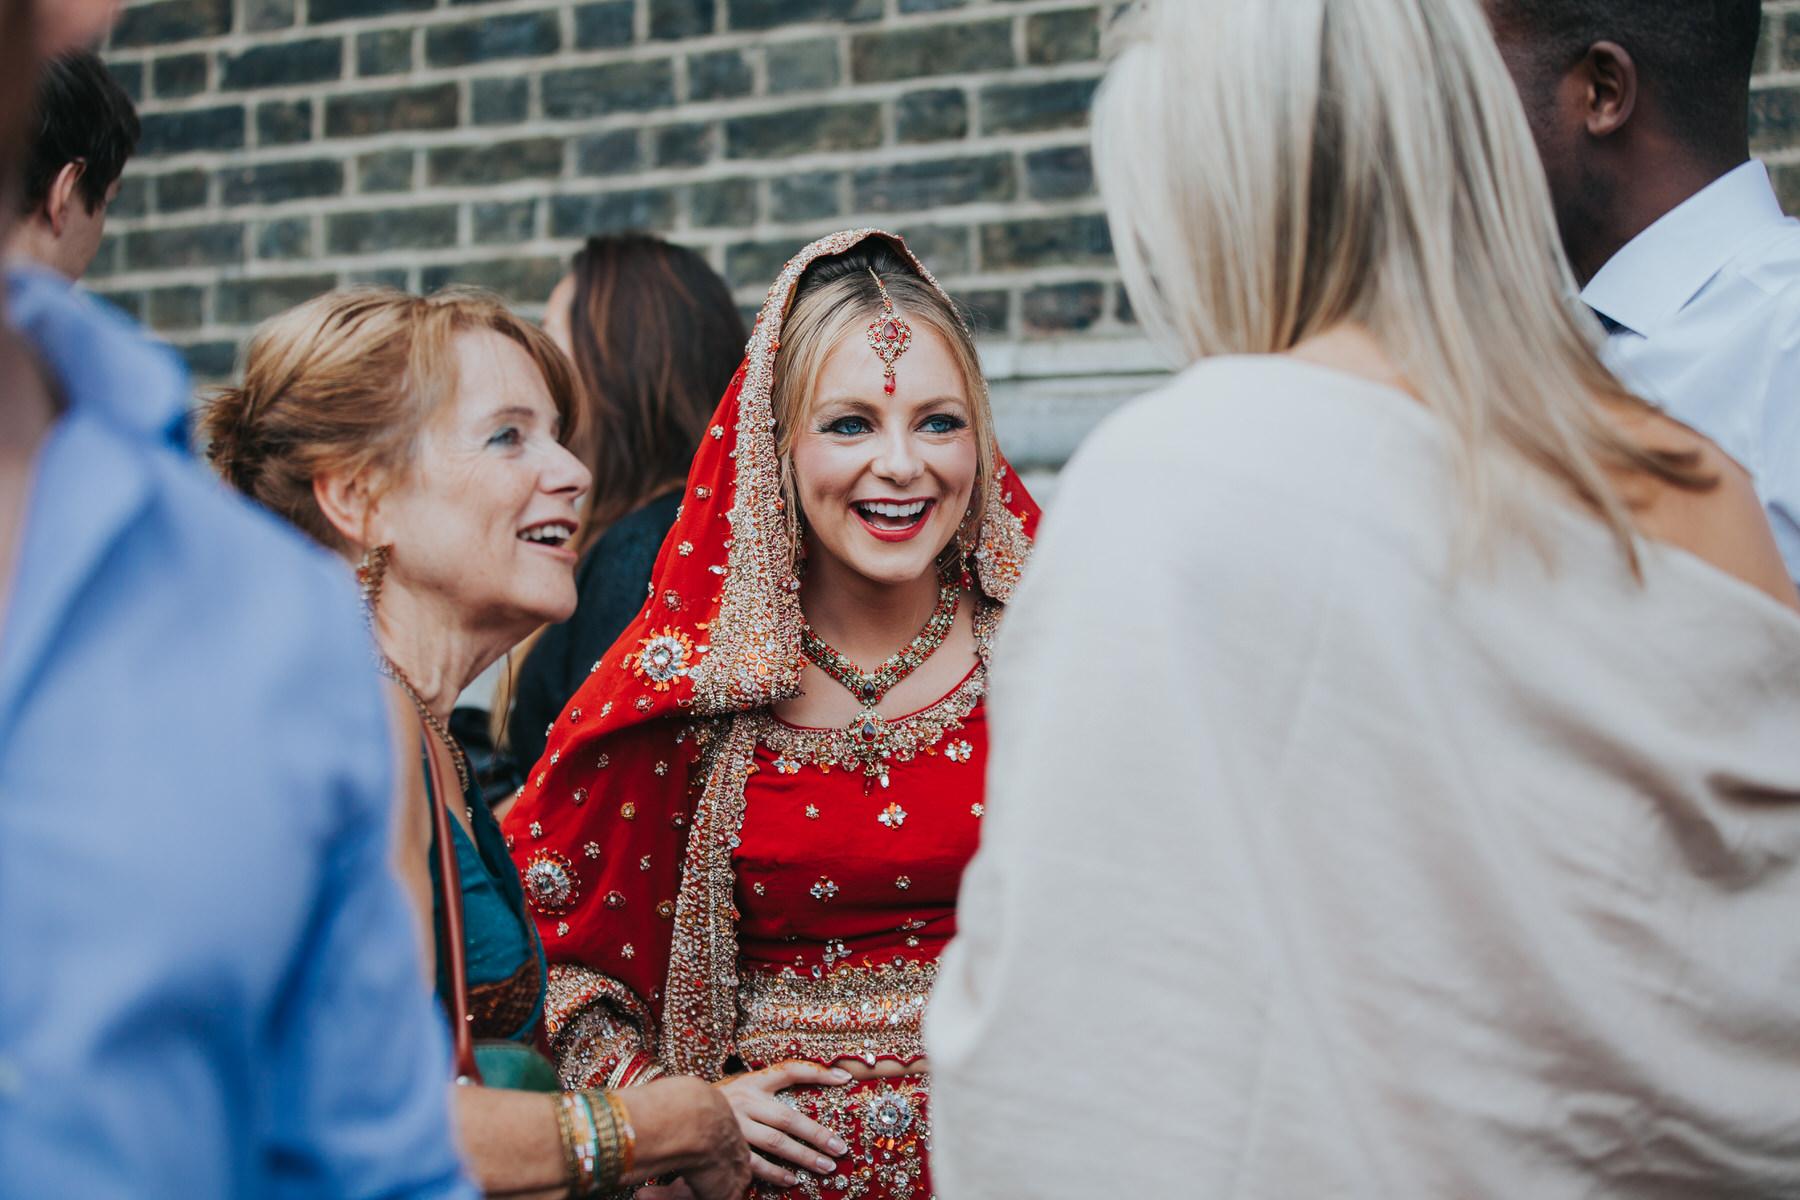 138-Anglo-Asian-London-Wedding-bride-mum-laughing.jpg